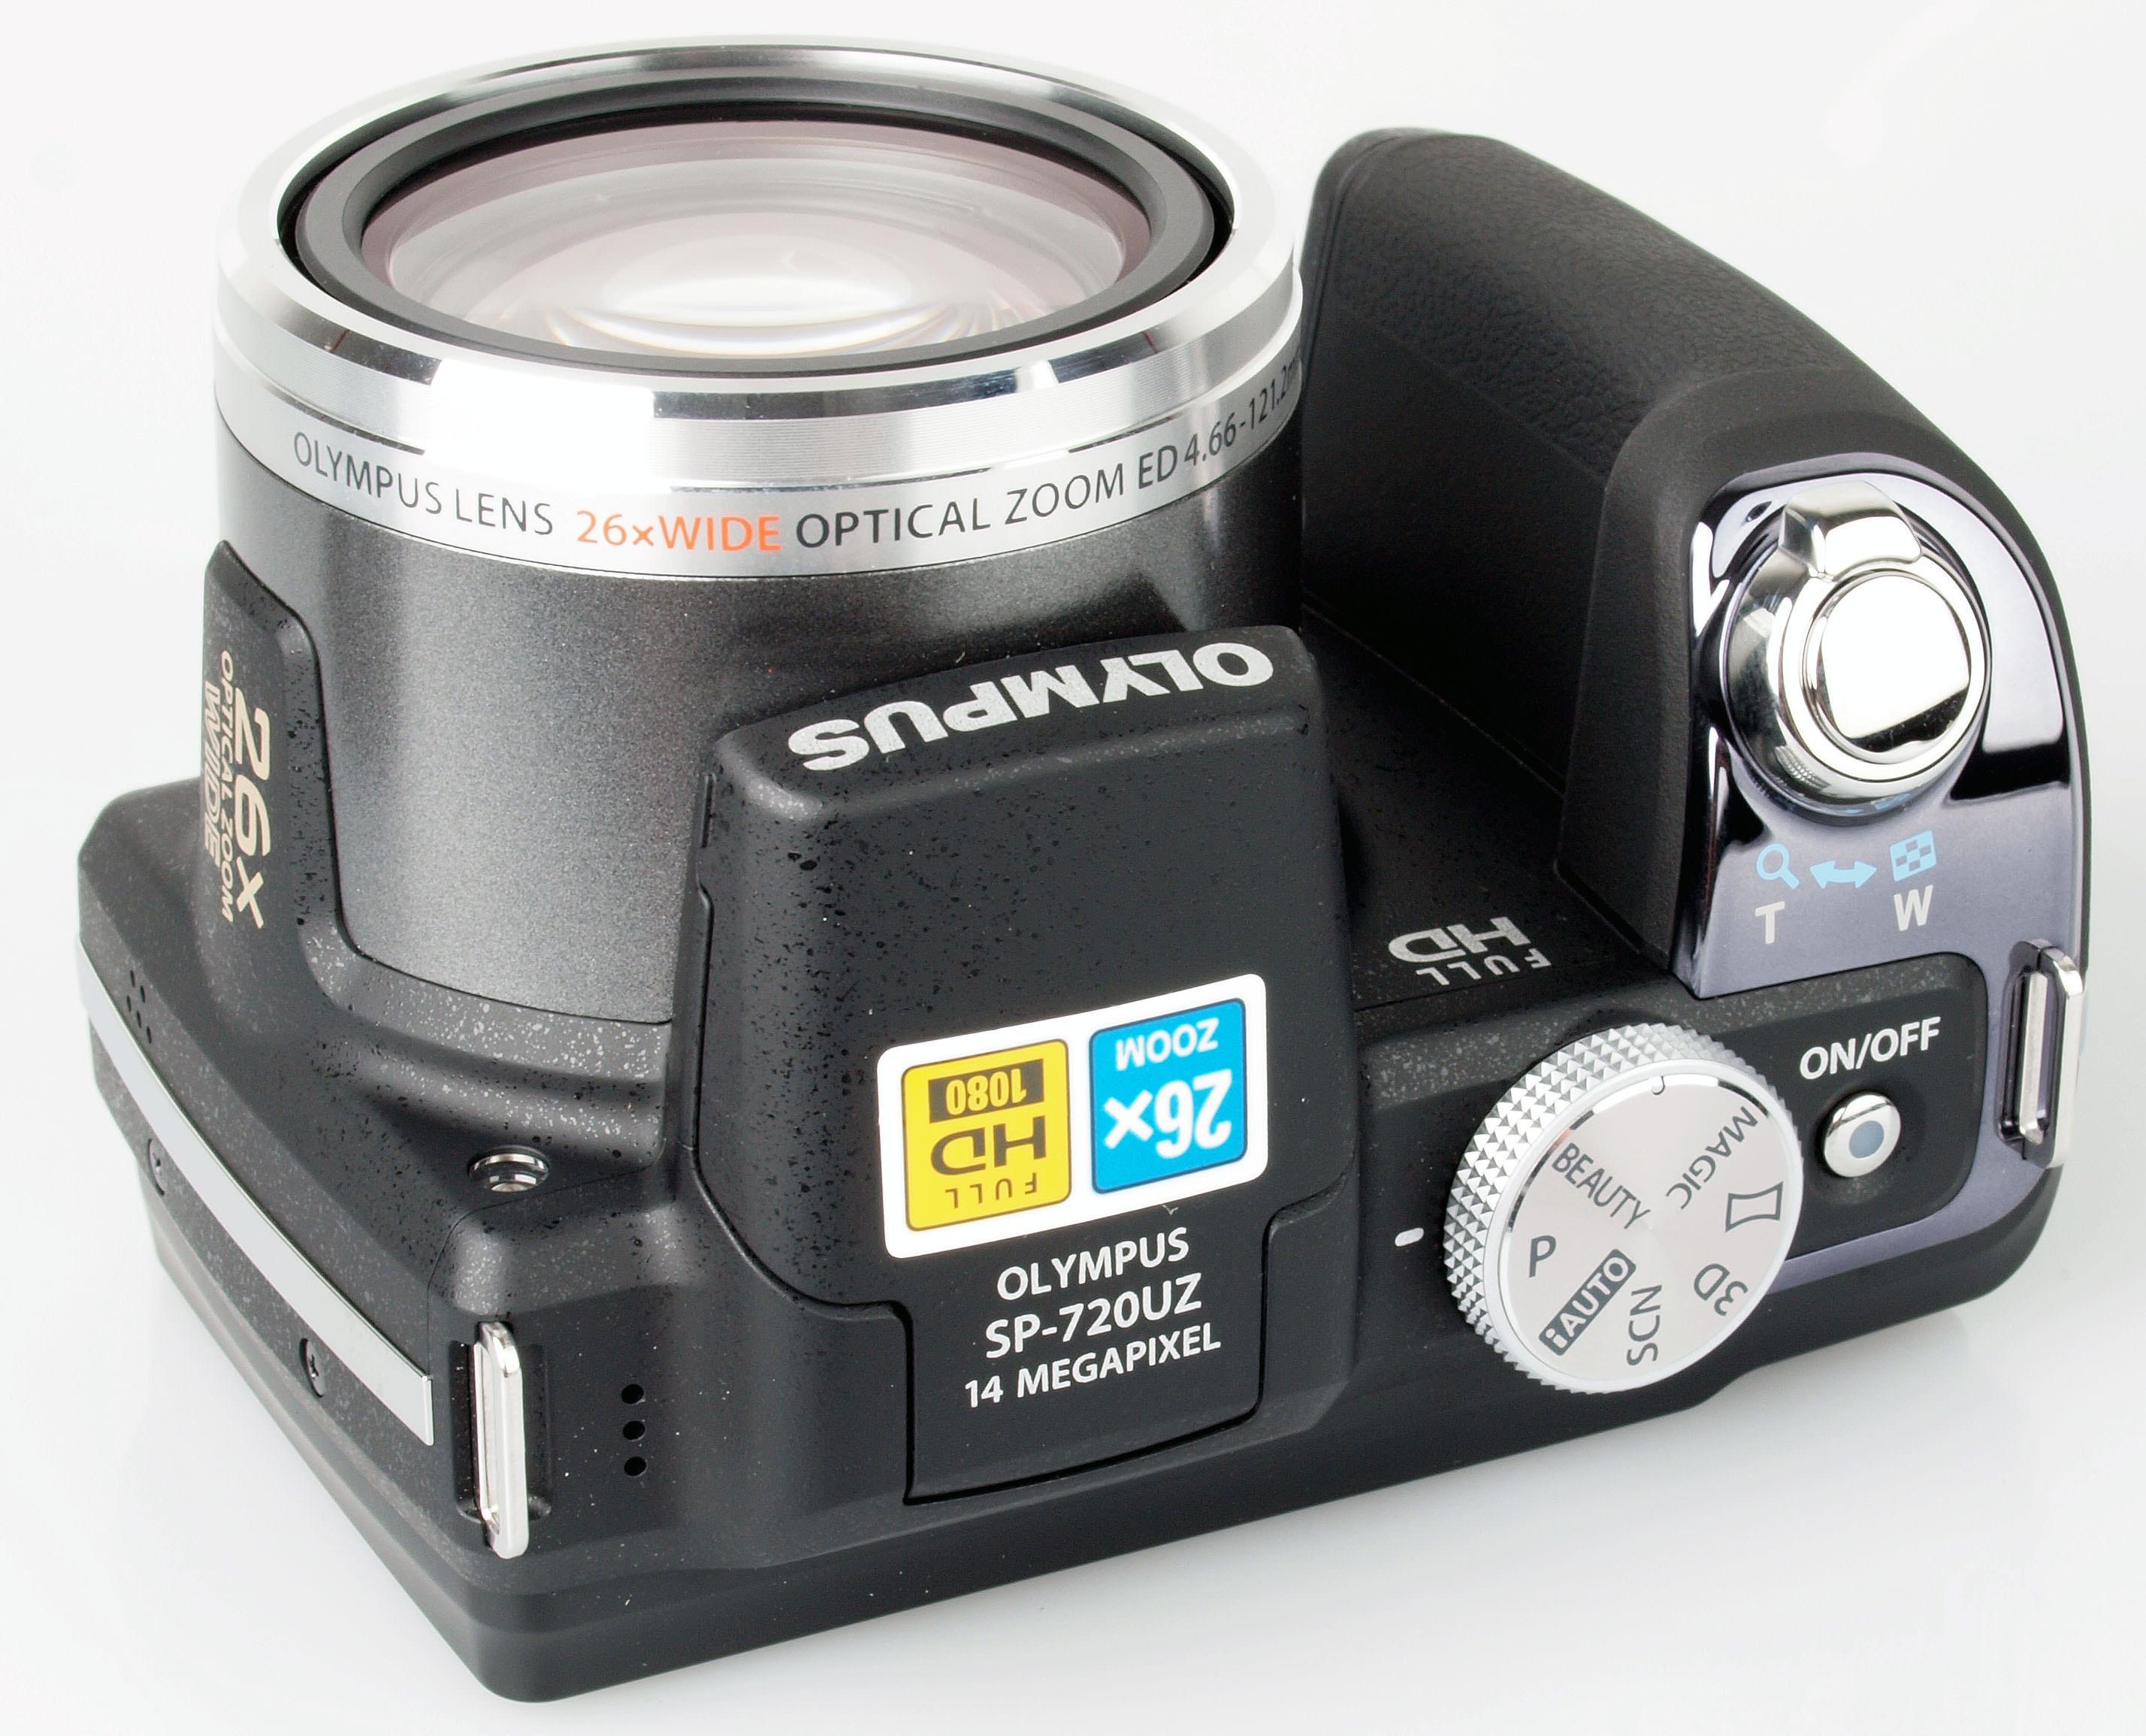 olympus sp 720uz digital camera review rh ephotozine com 14MP Olympus SP-720UZ 14MP Olympus SP-720UZ